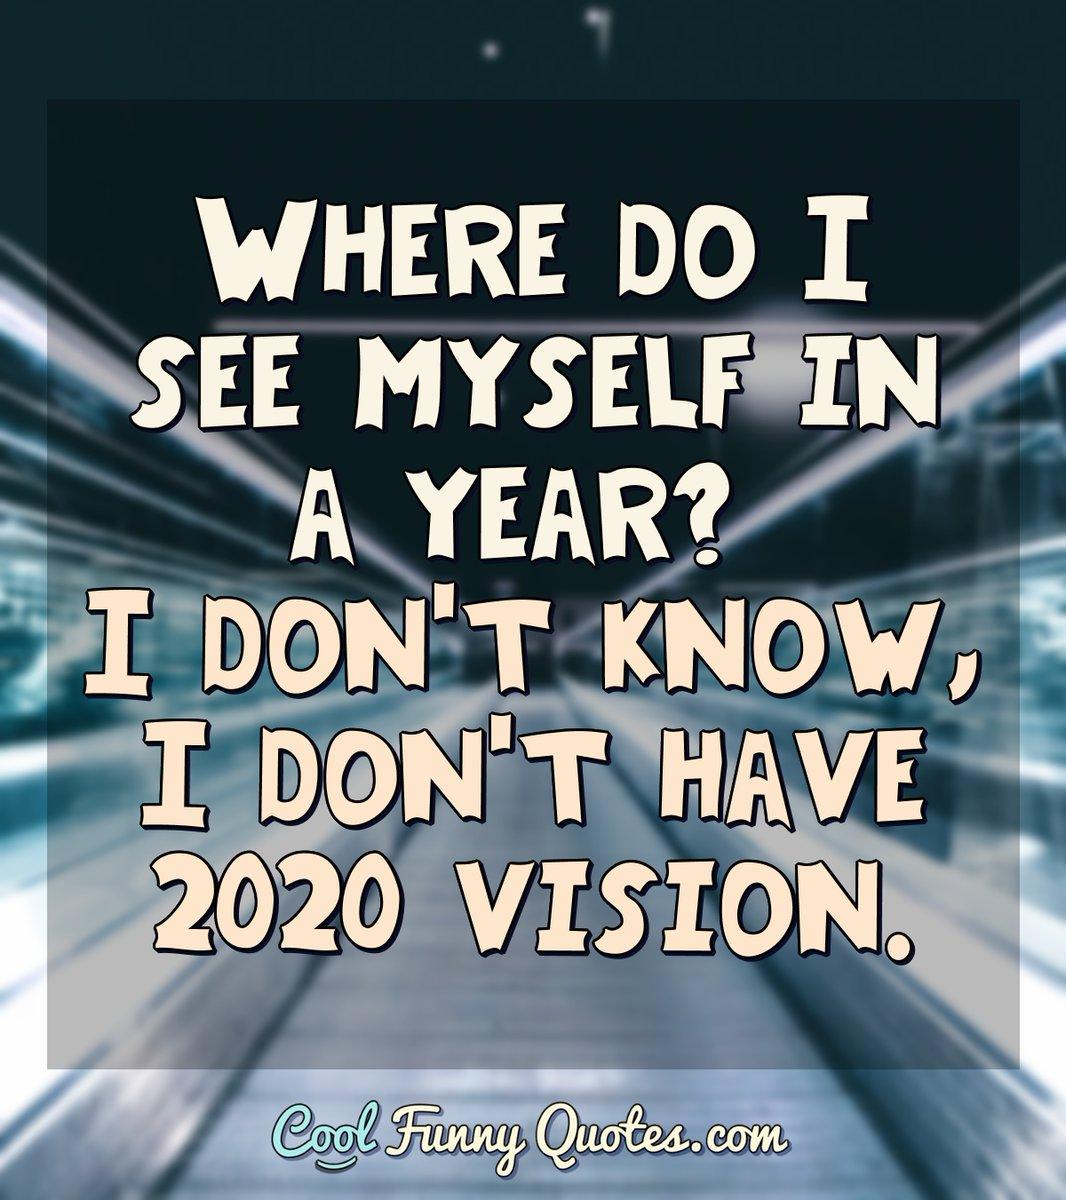 I DON'T HAVE VISION